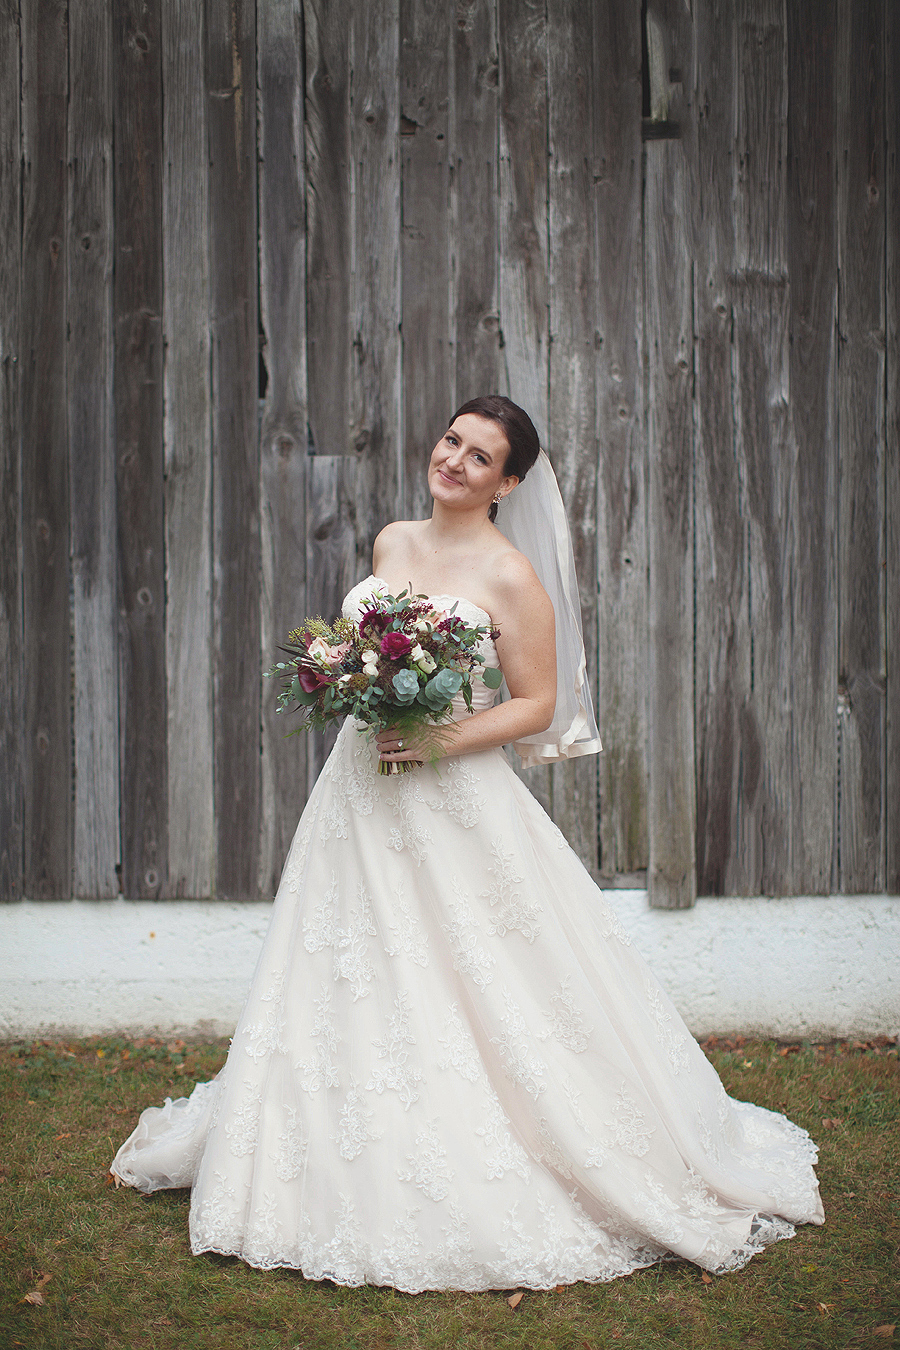 Toledo_Cleveland_Ohio_Wedding_Portrait_Photographer-50.jpg